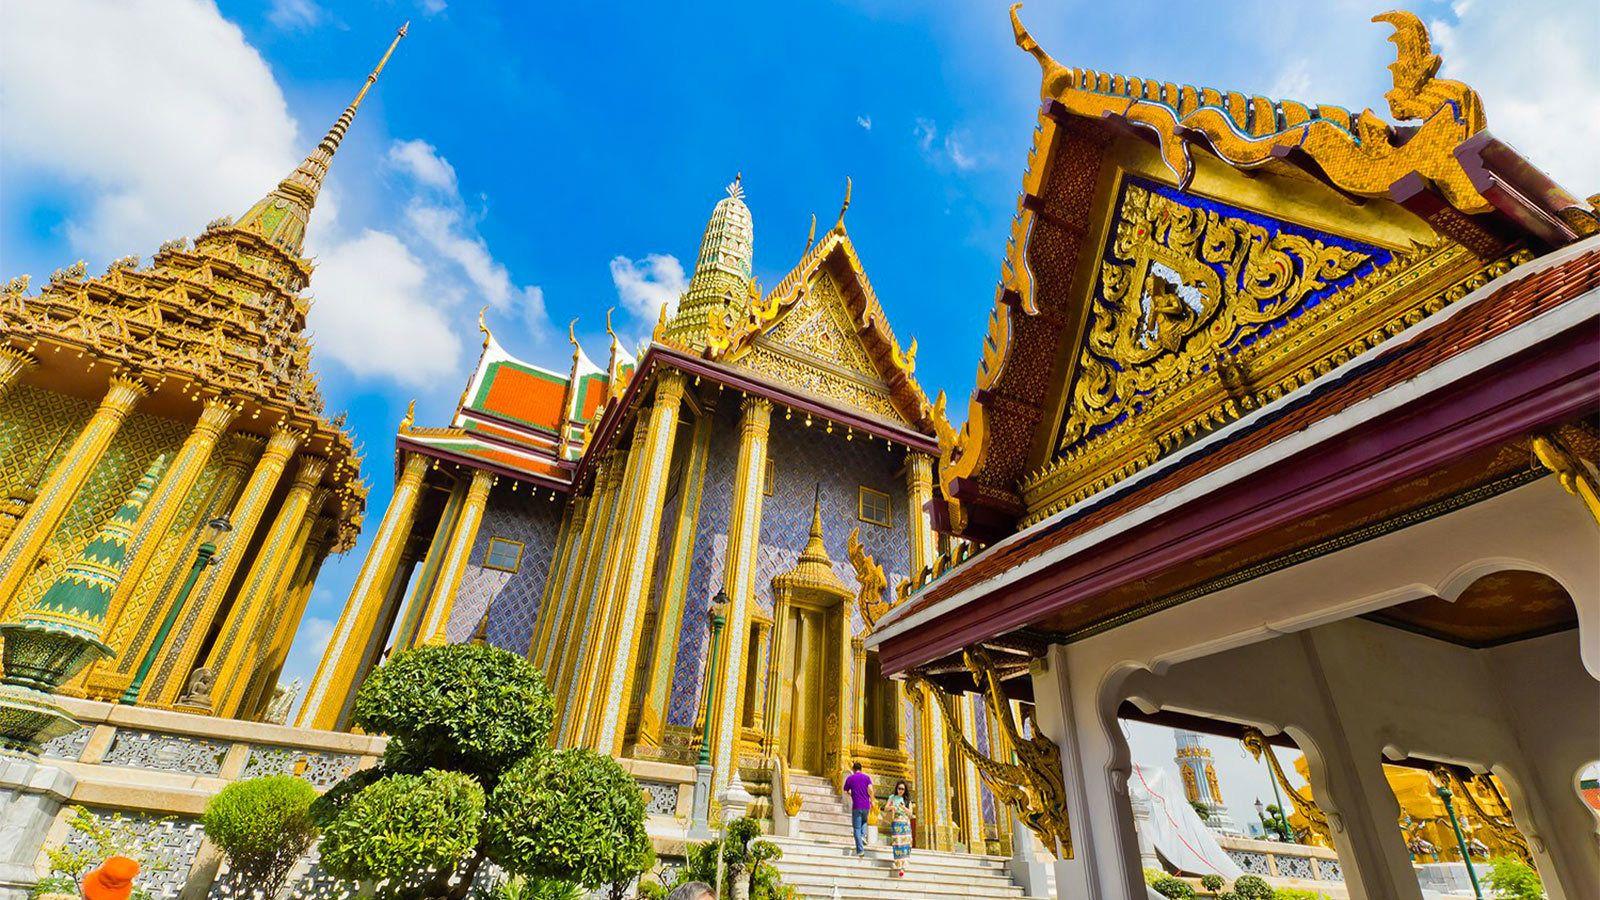 Grand palace tour in Bangkok